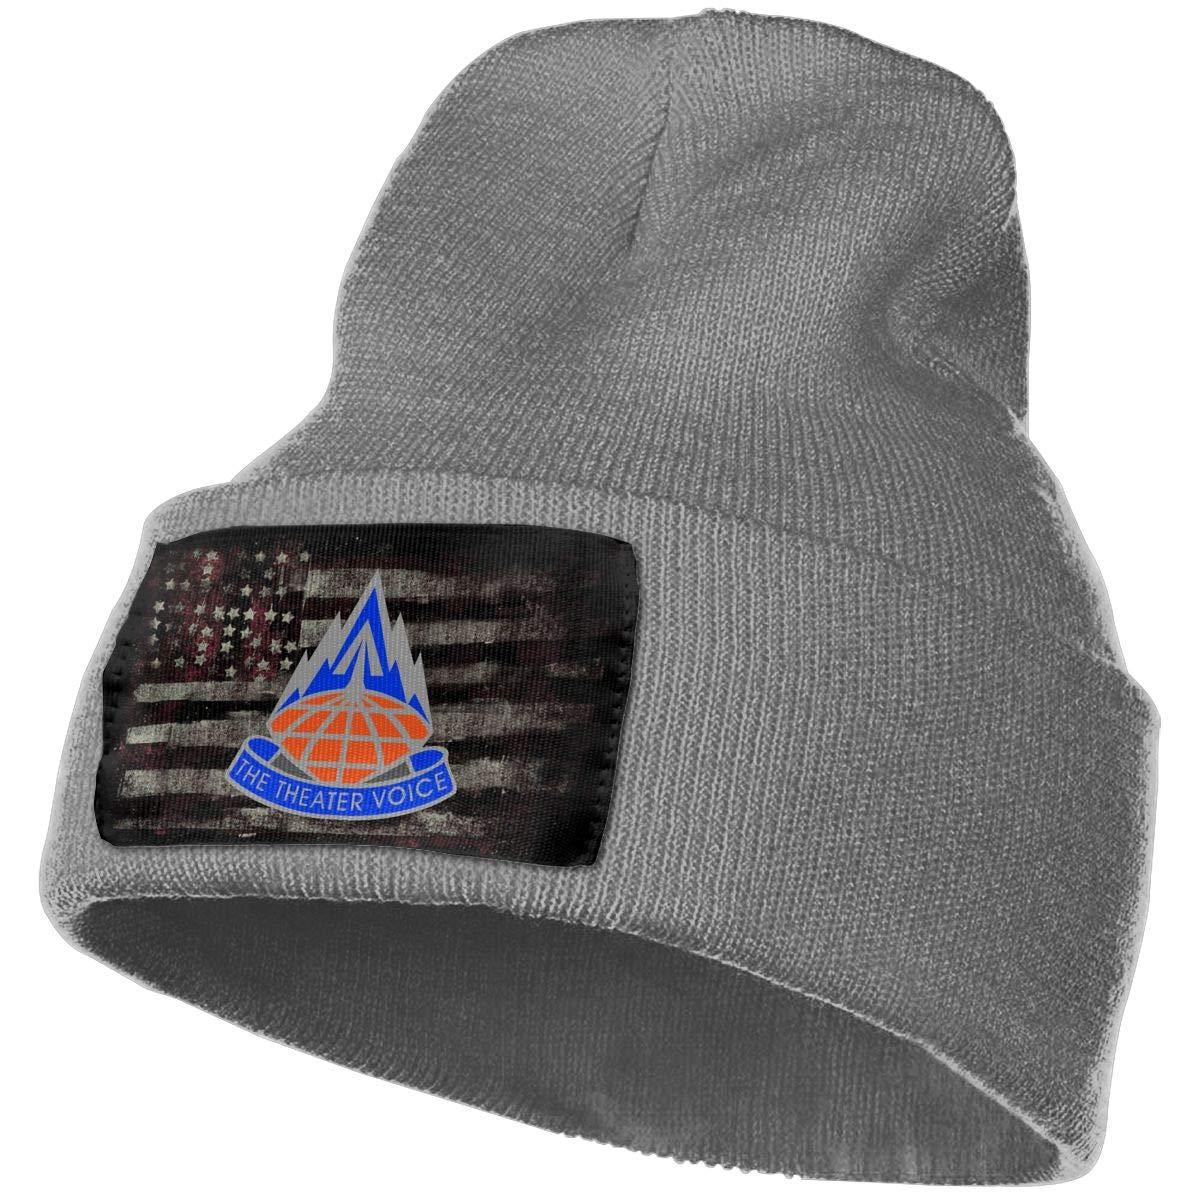 US Army 311th Signal Command Unit Crest Mens Beanie Cap Skull Cap Winter Warm Knitting Hats.